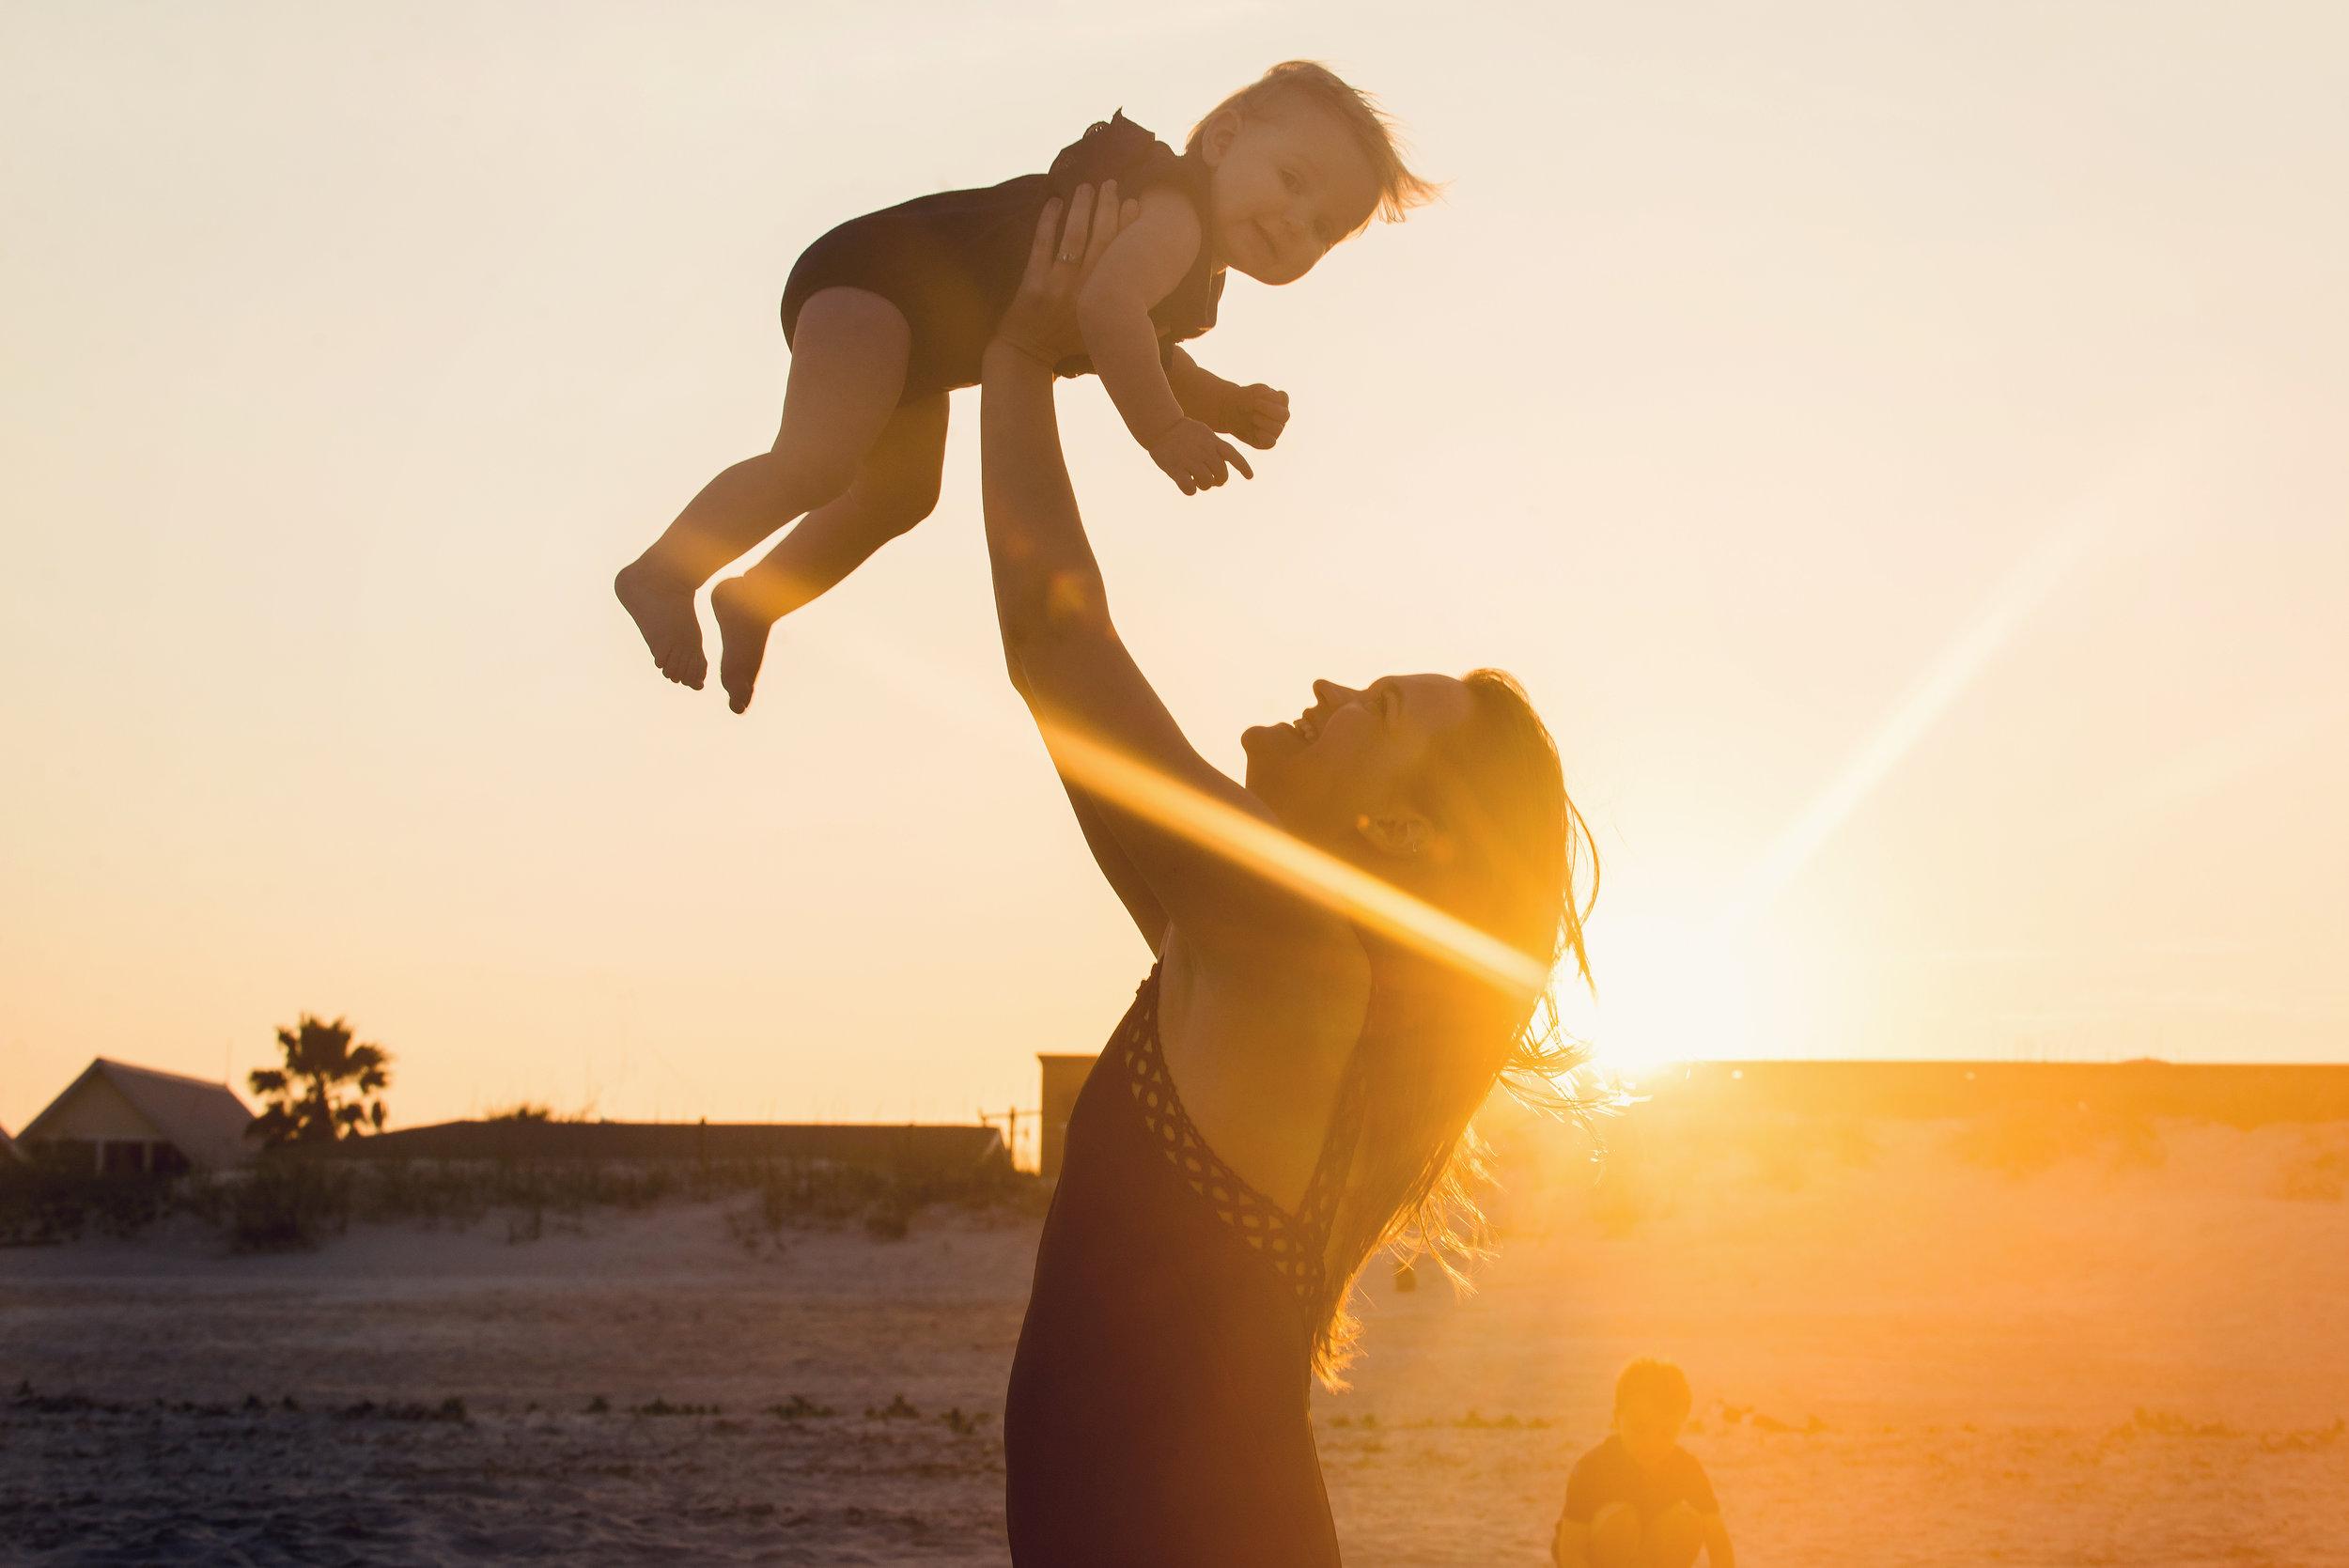 st-augustine-vacation-family-portrait-photographer